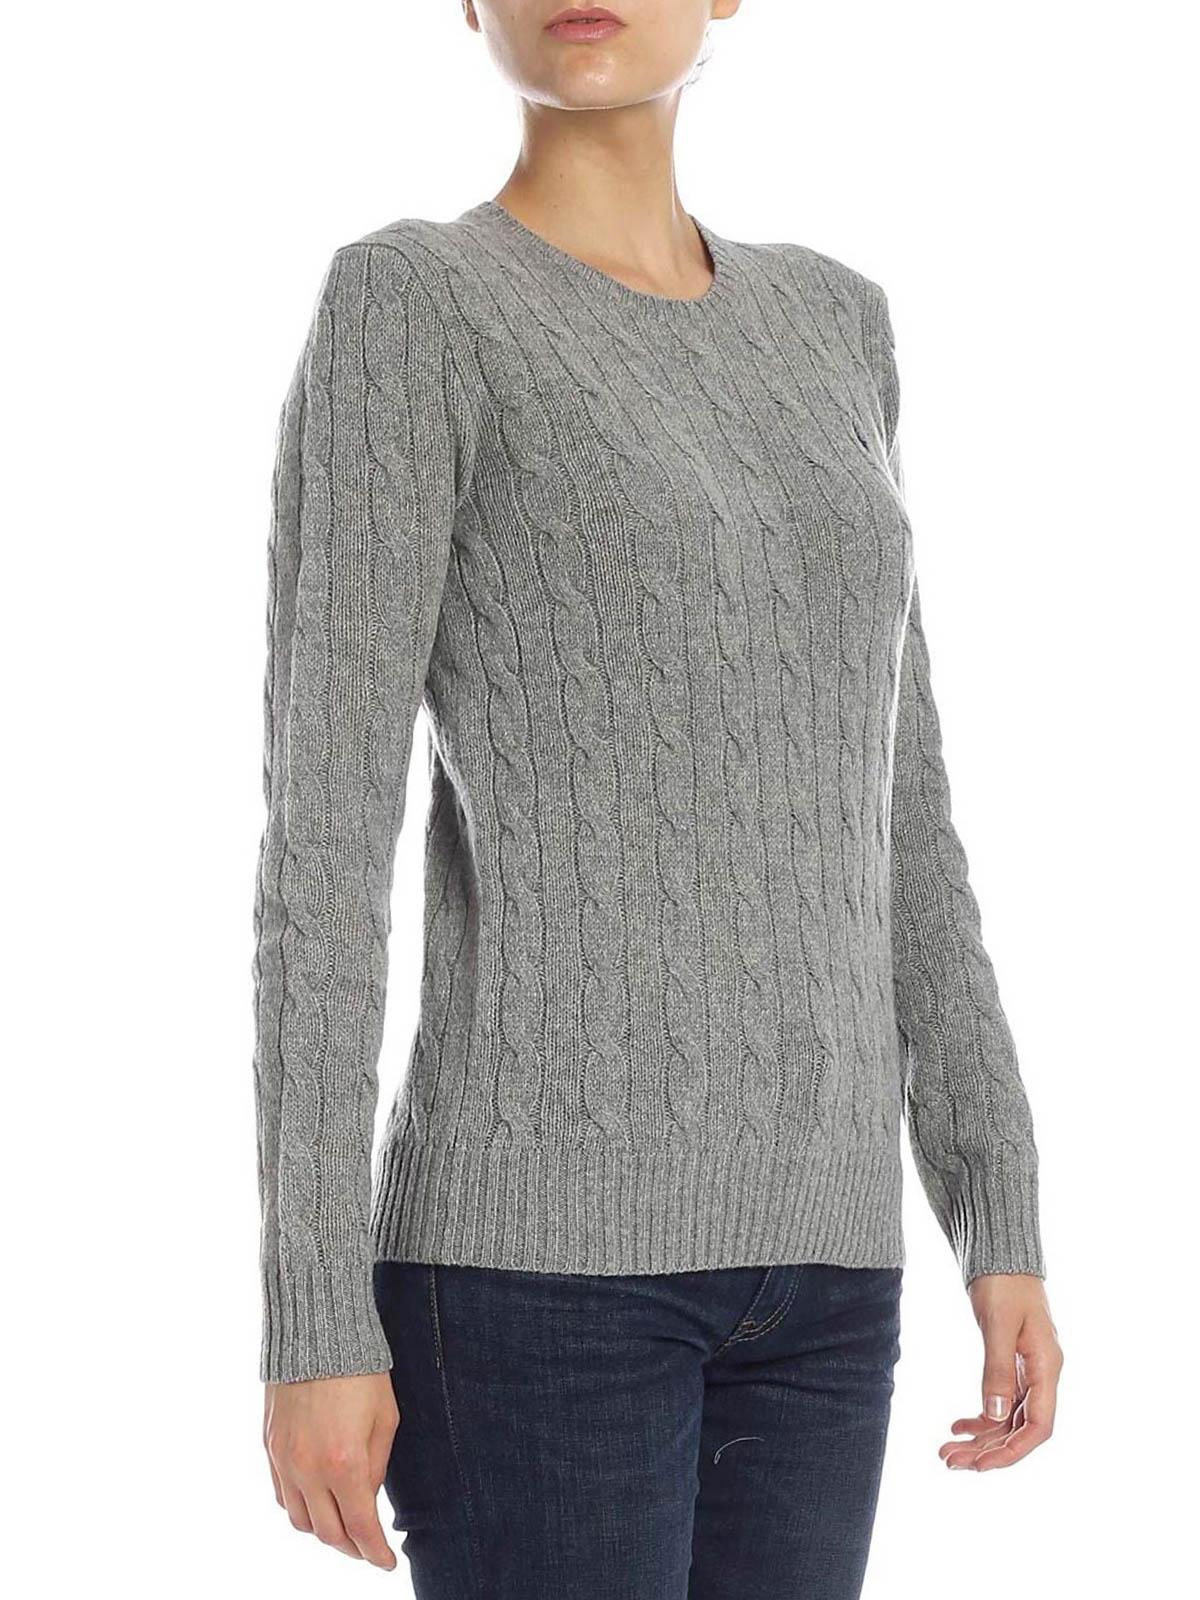 Grey twist knit cotton sweater POLO RALPH LAUREN | 7 | 211525764009